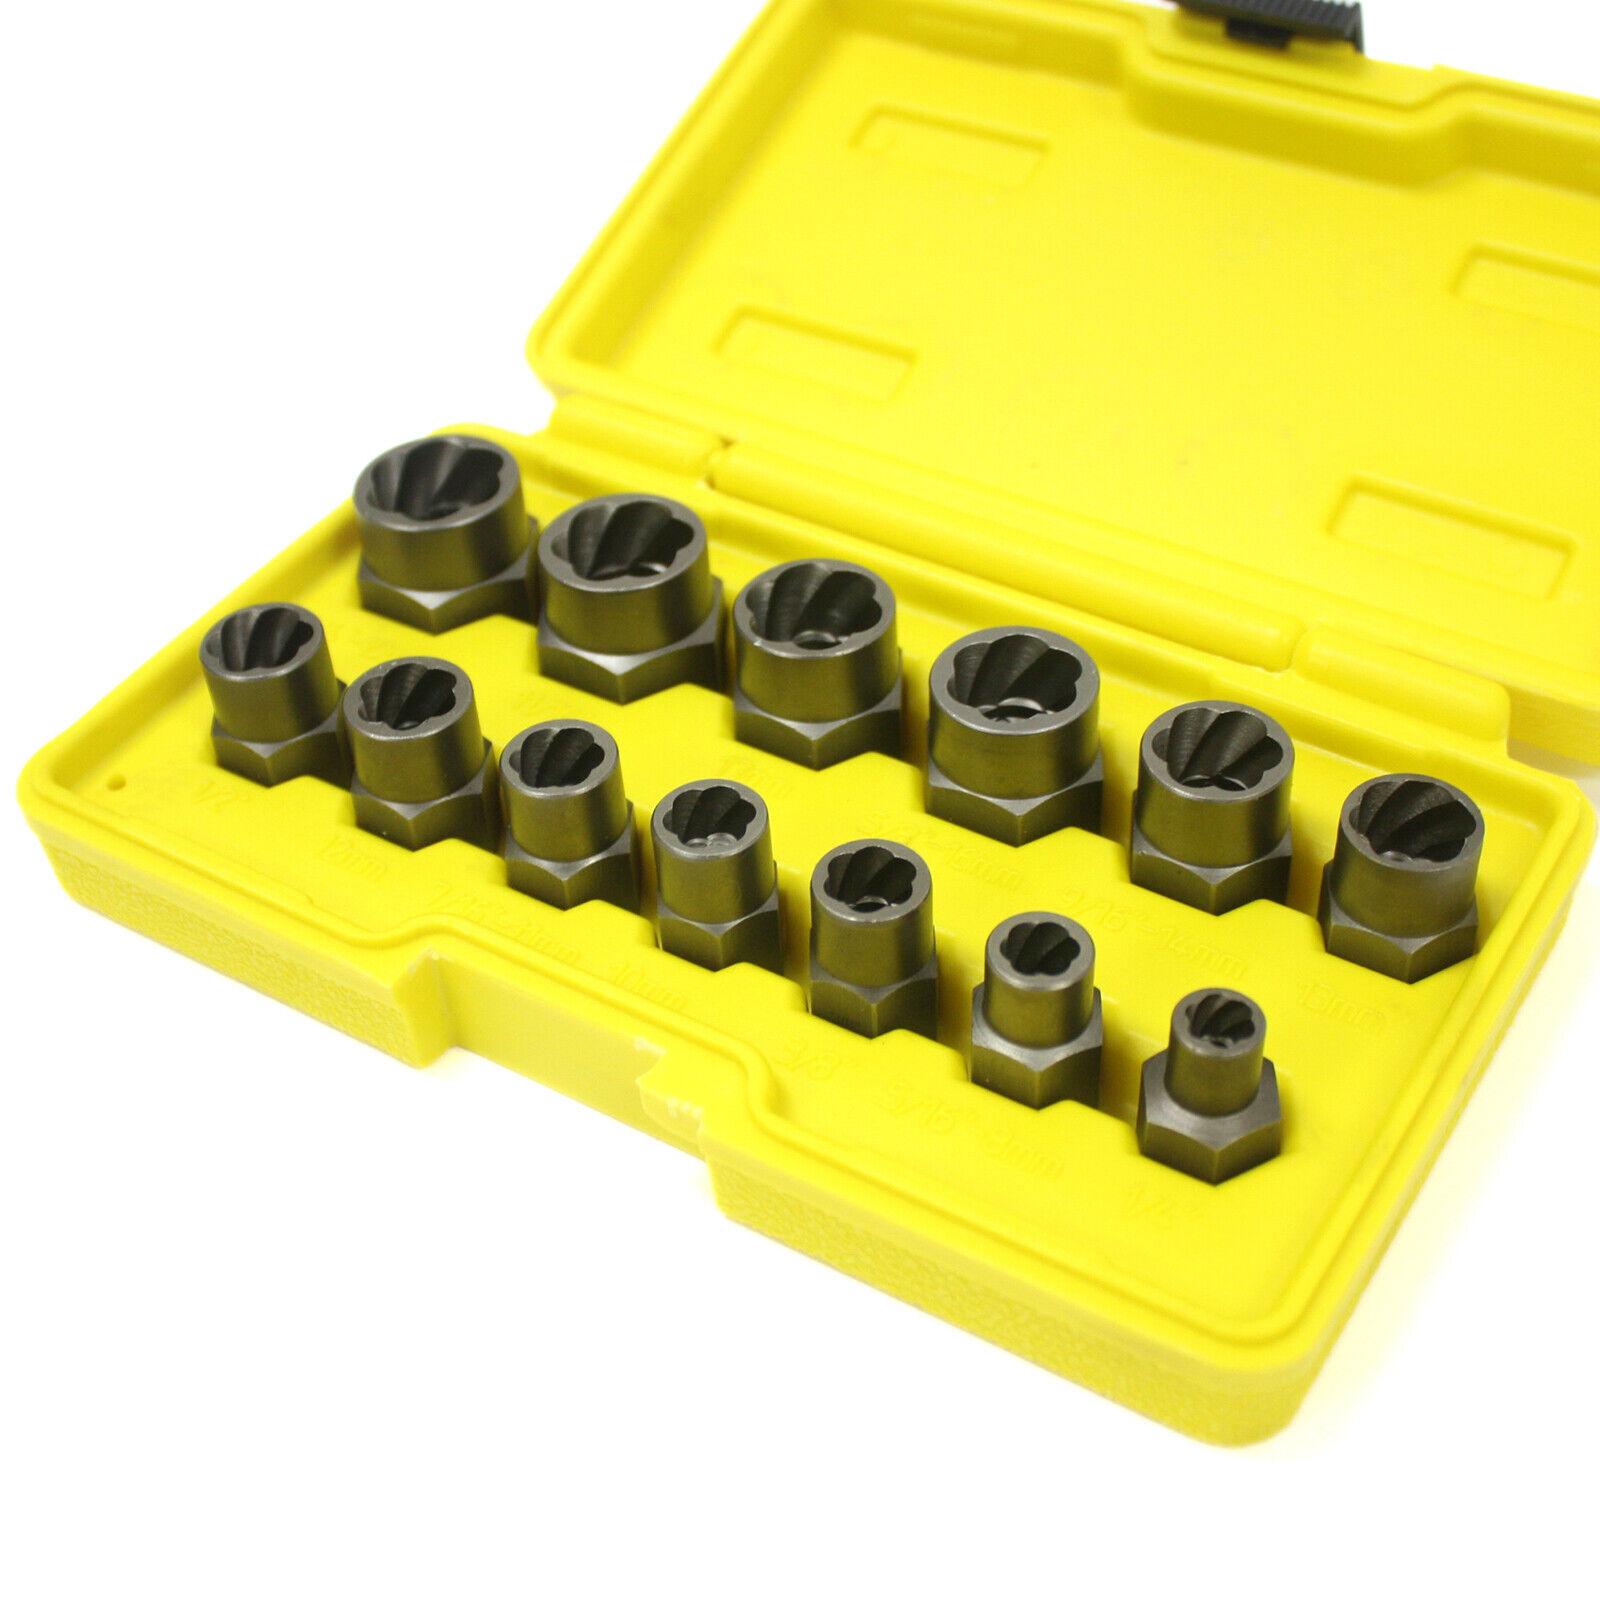 Hanson 54113 13pc Metric Sae Bolt Extractor Set For Sale Online Ebay